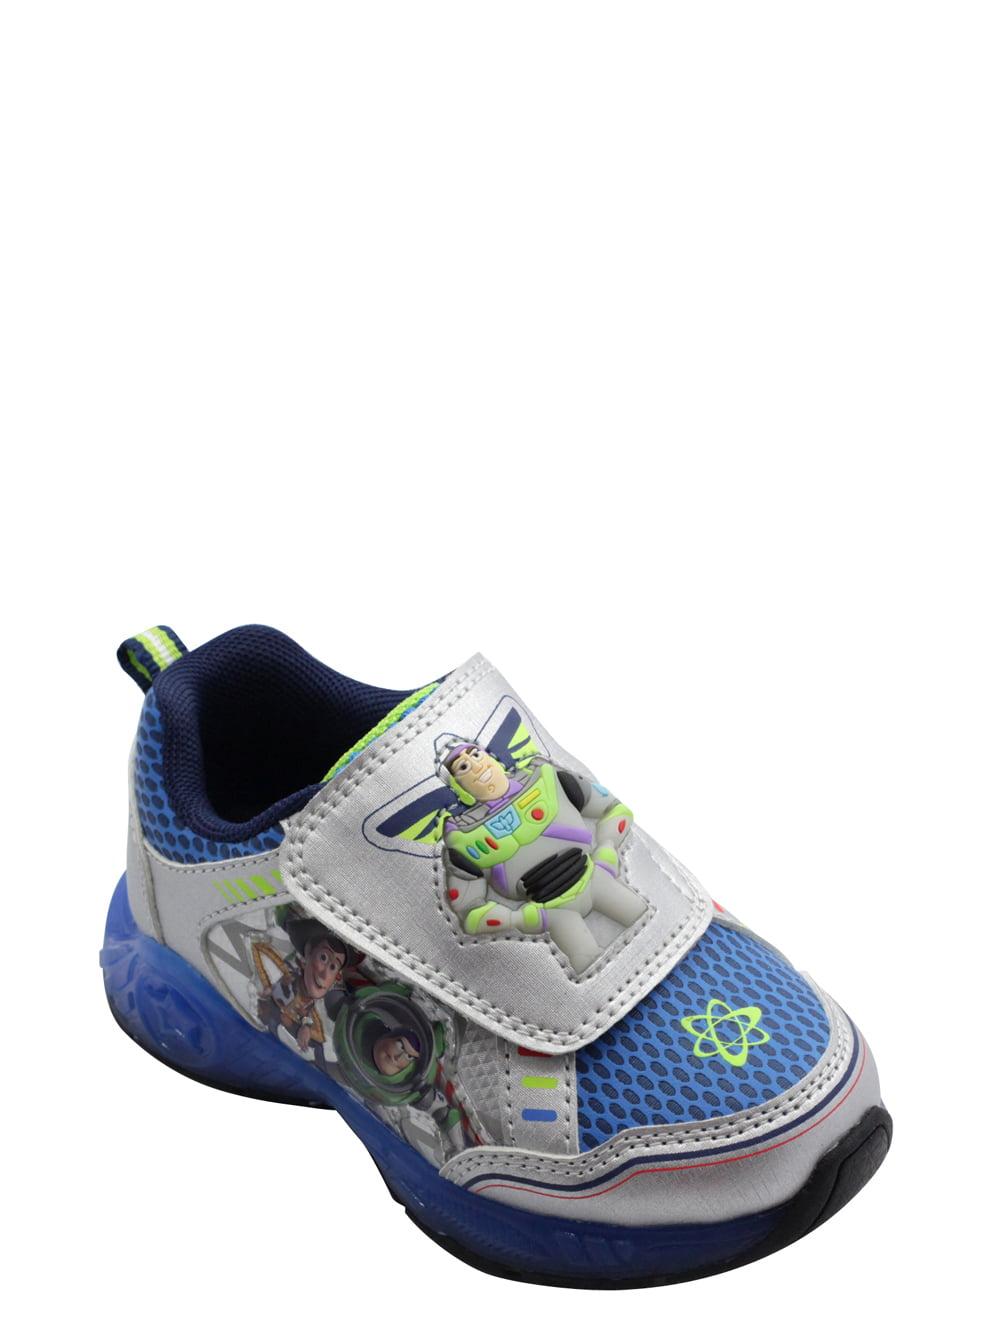 remote control light up shoes walmart